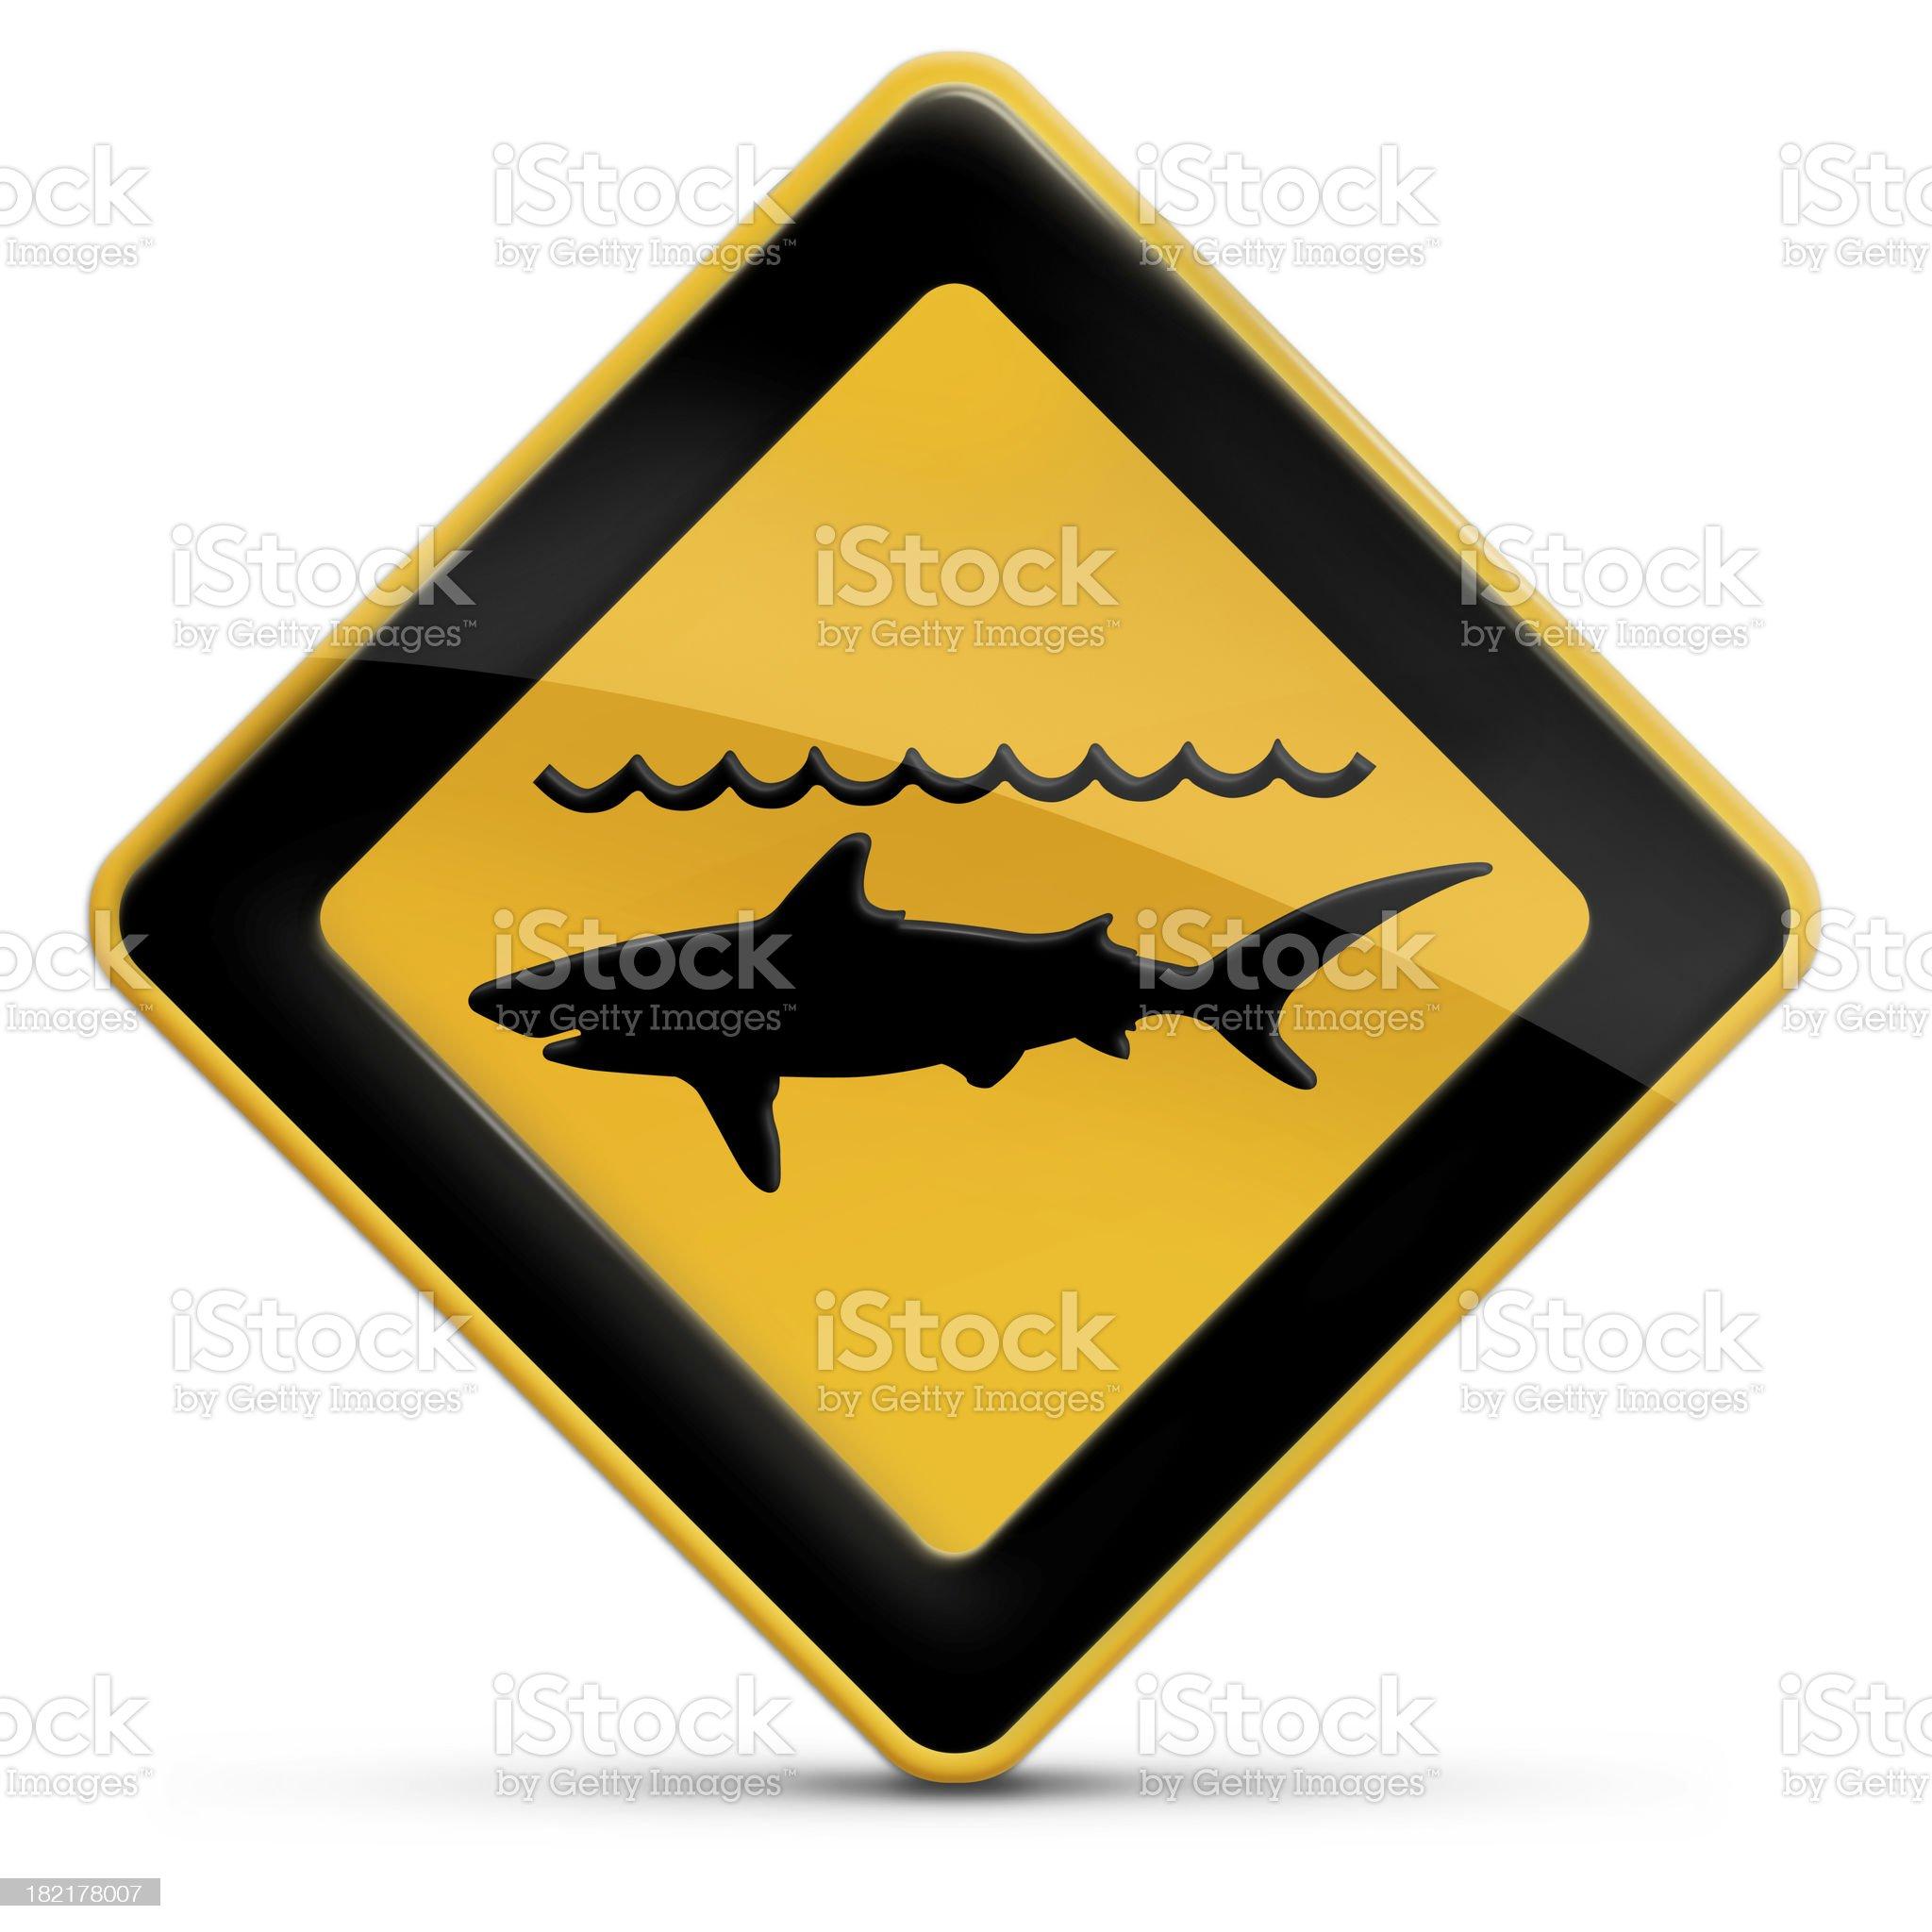 Shark Attack royalty-free stock photo